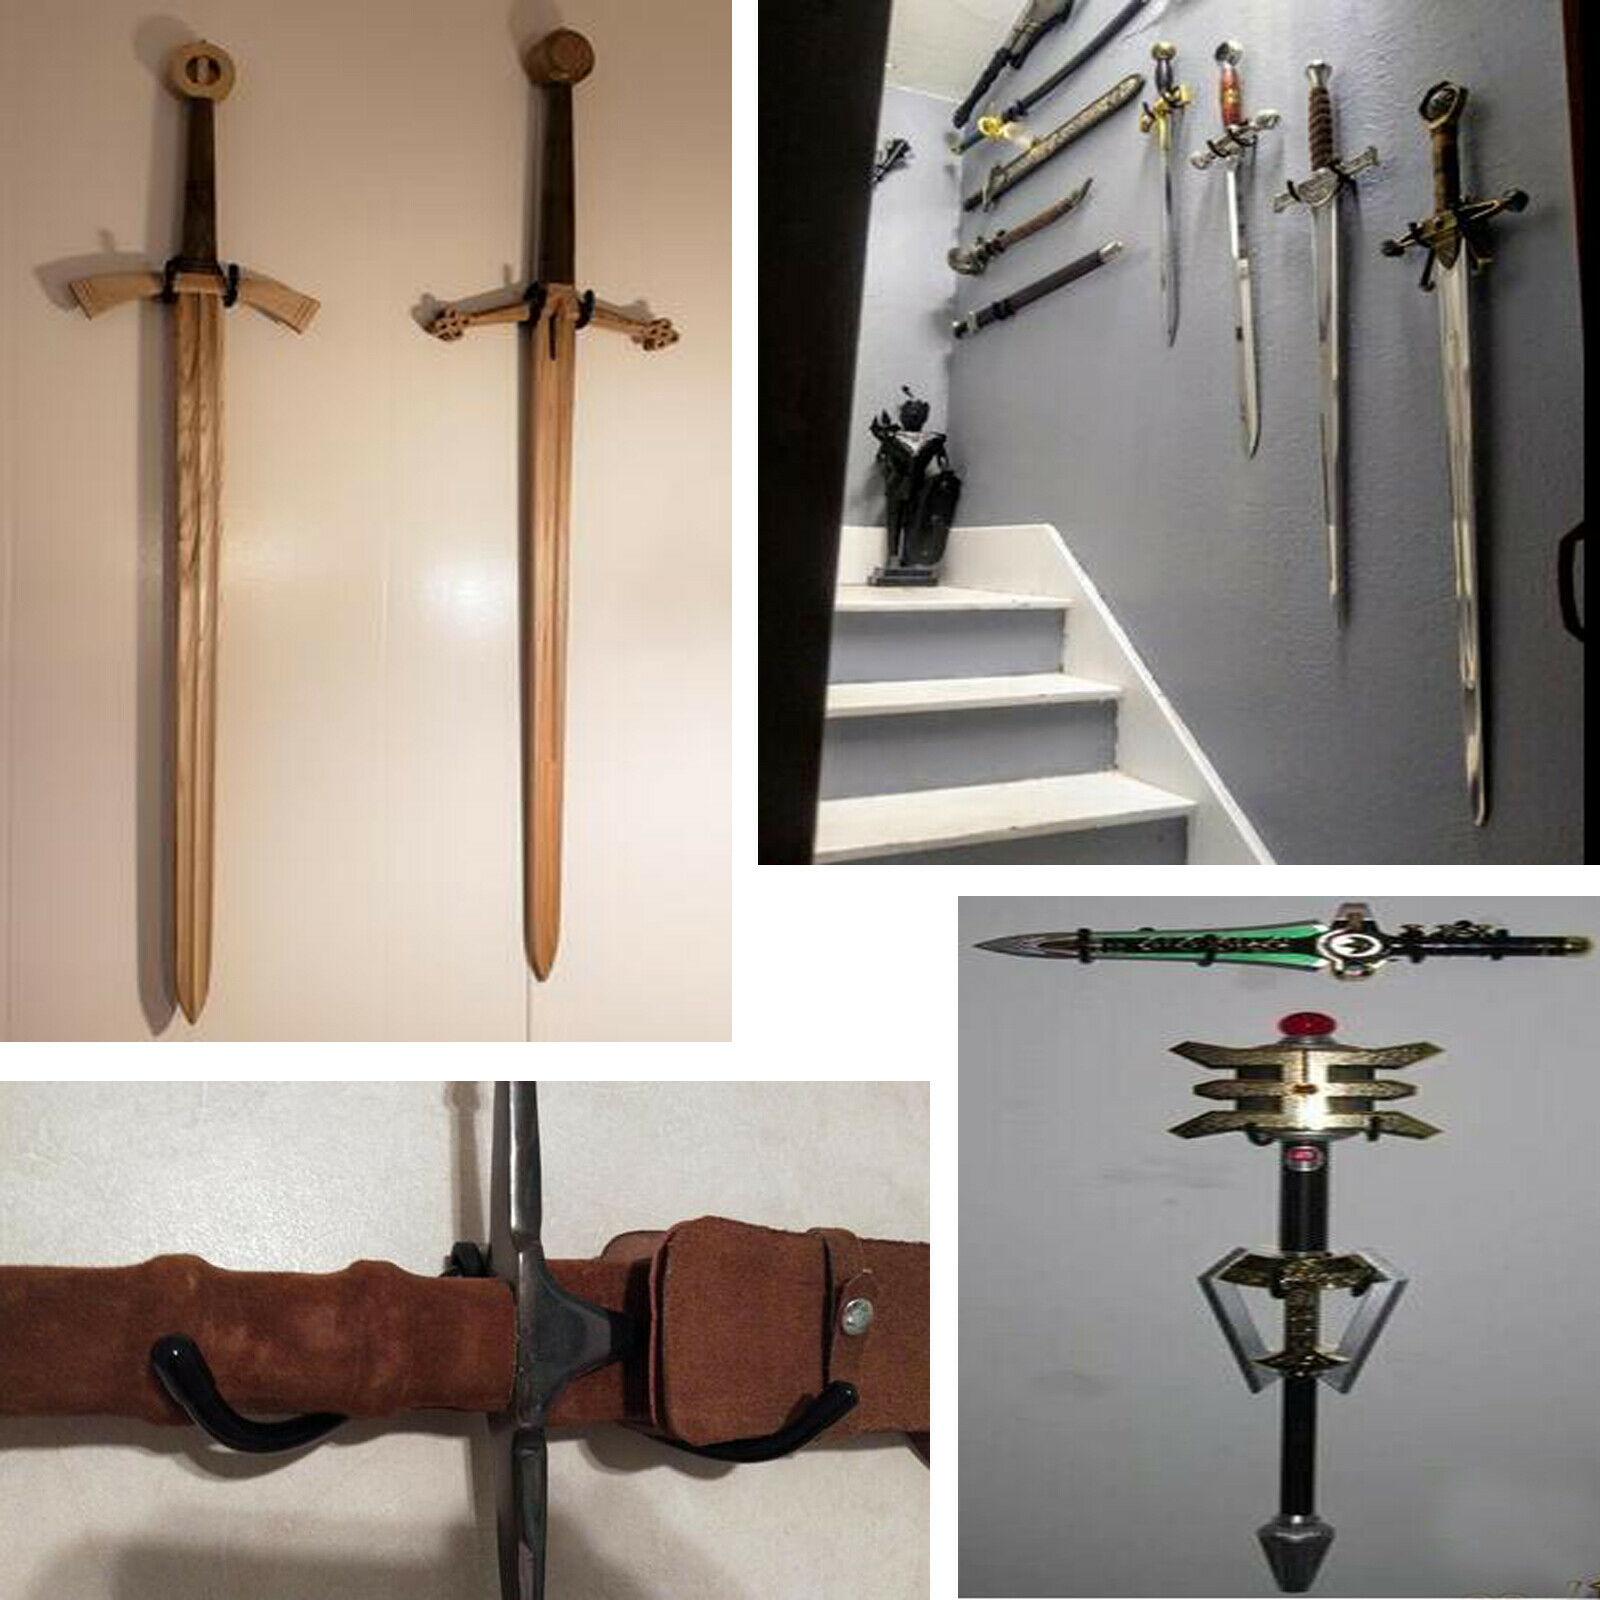 Universal Sword Stand Display Hanger Wall Rack for Sword,Dagger,Axe,Keyblade